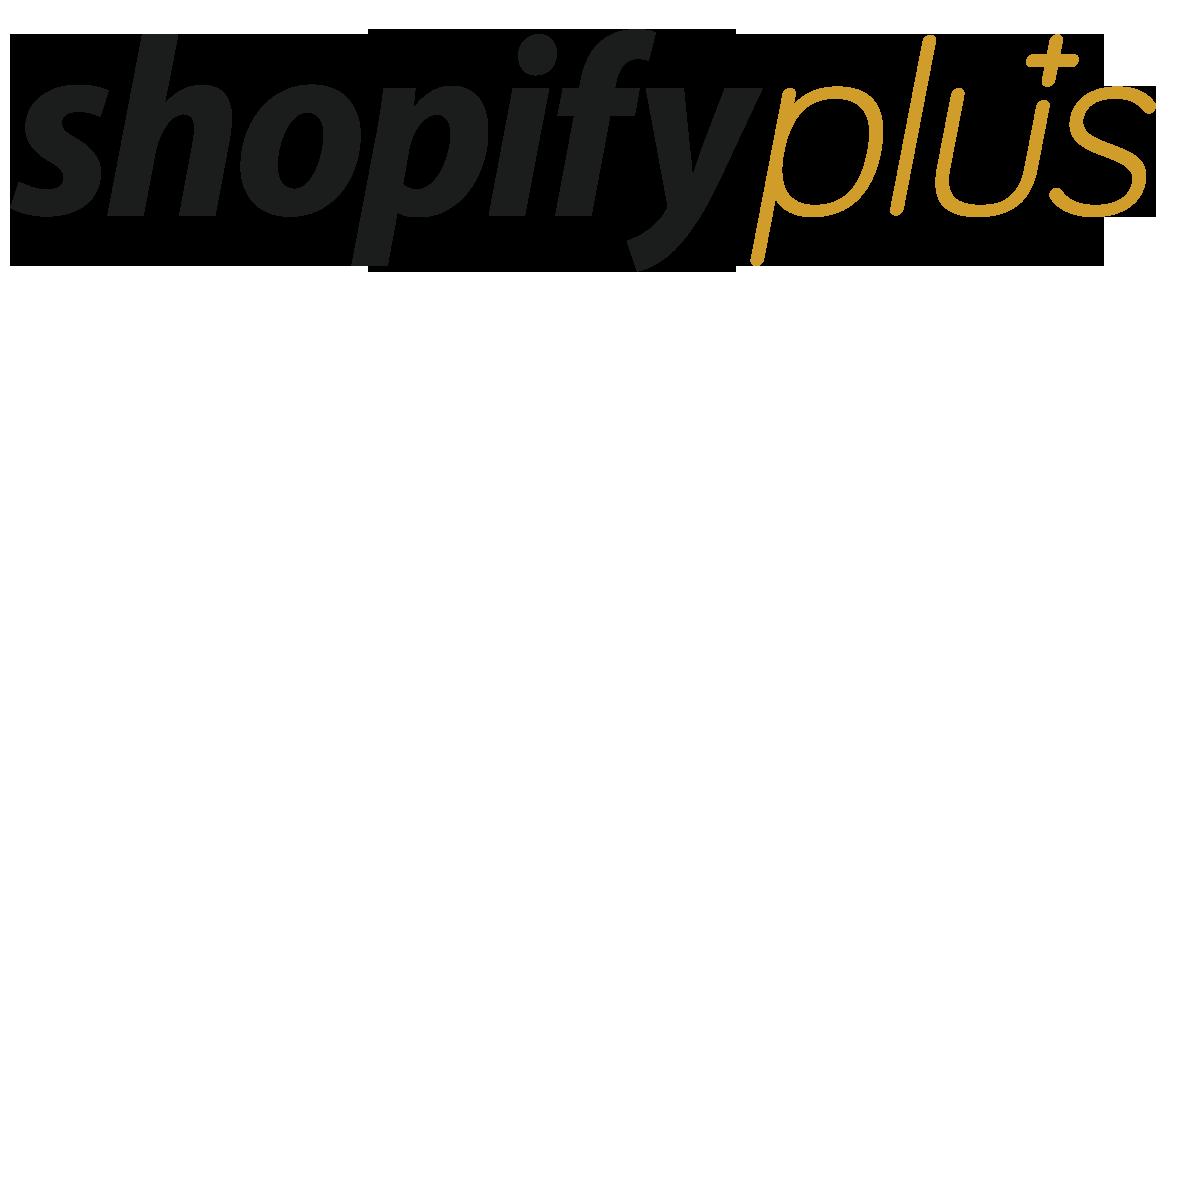 shopifyplus logo